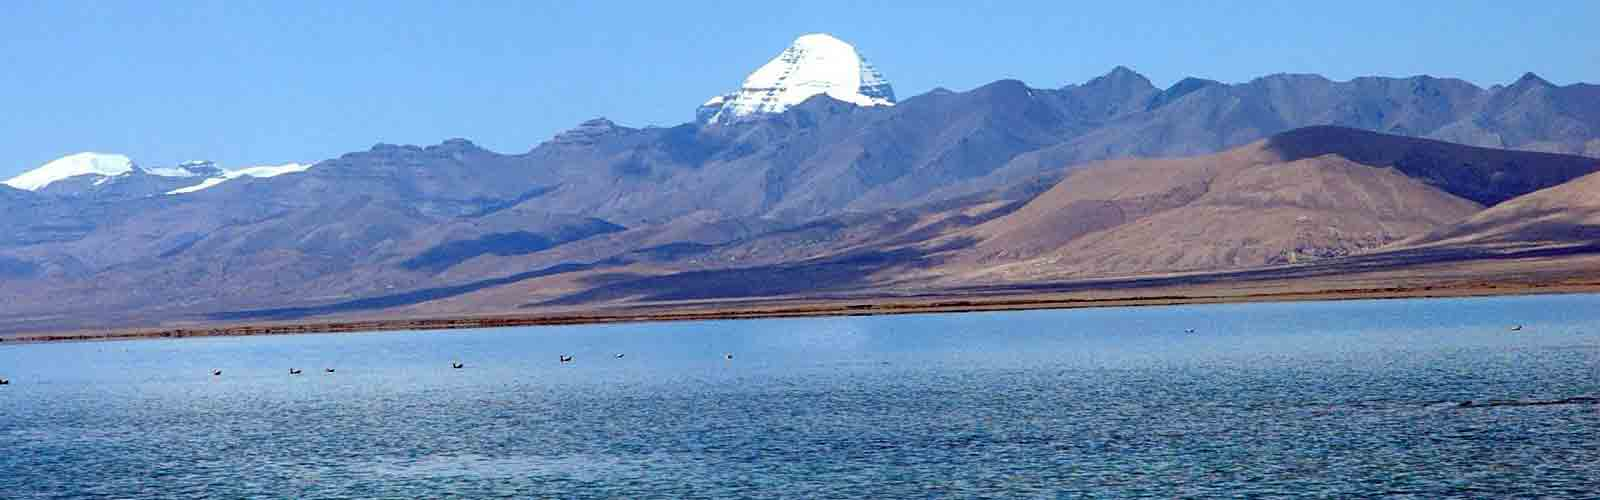 Kailash Tour Informations